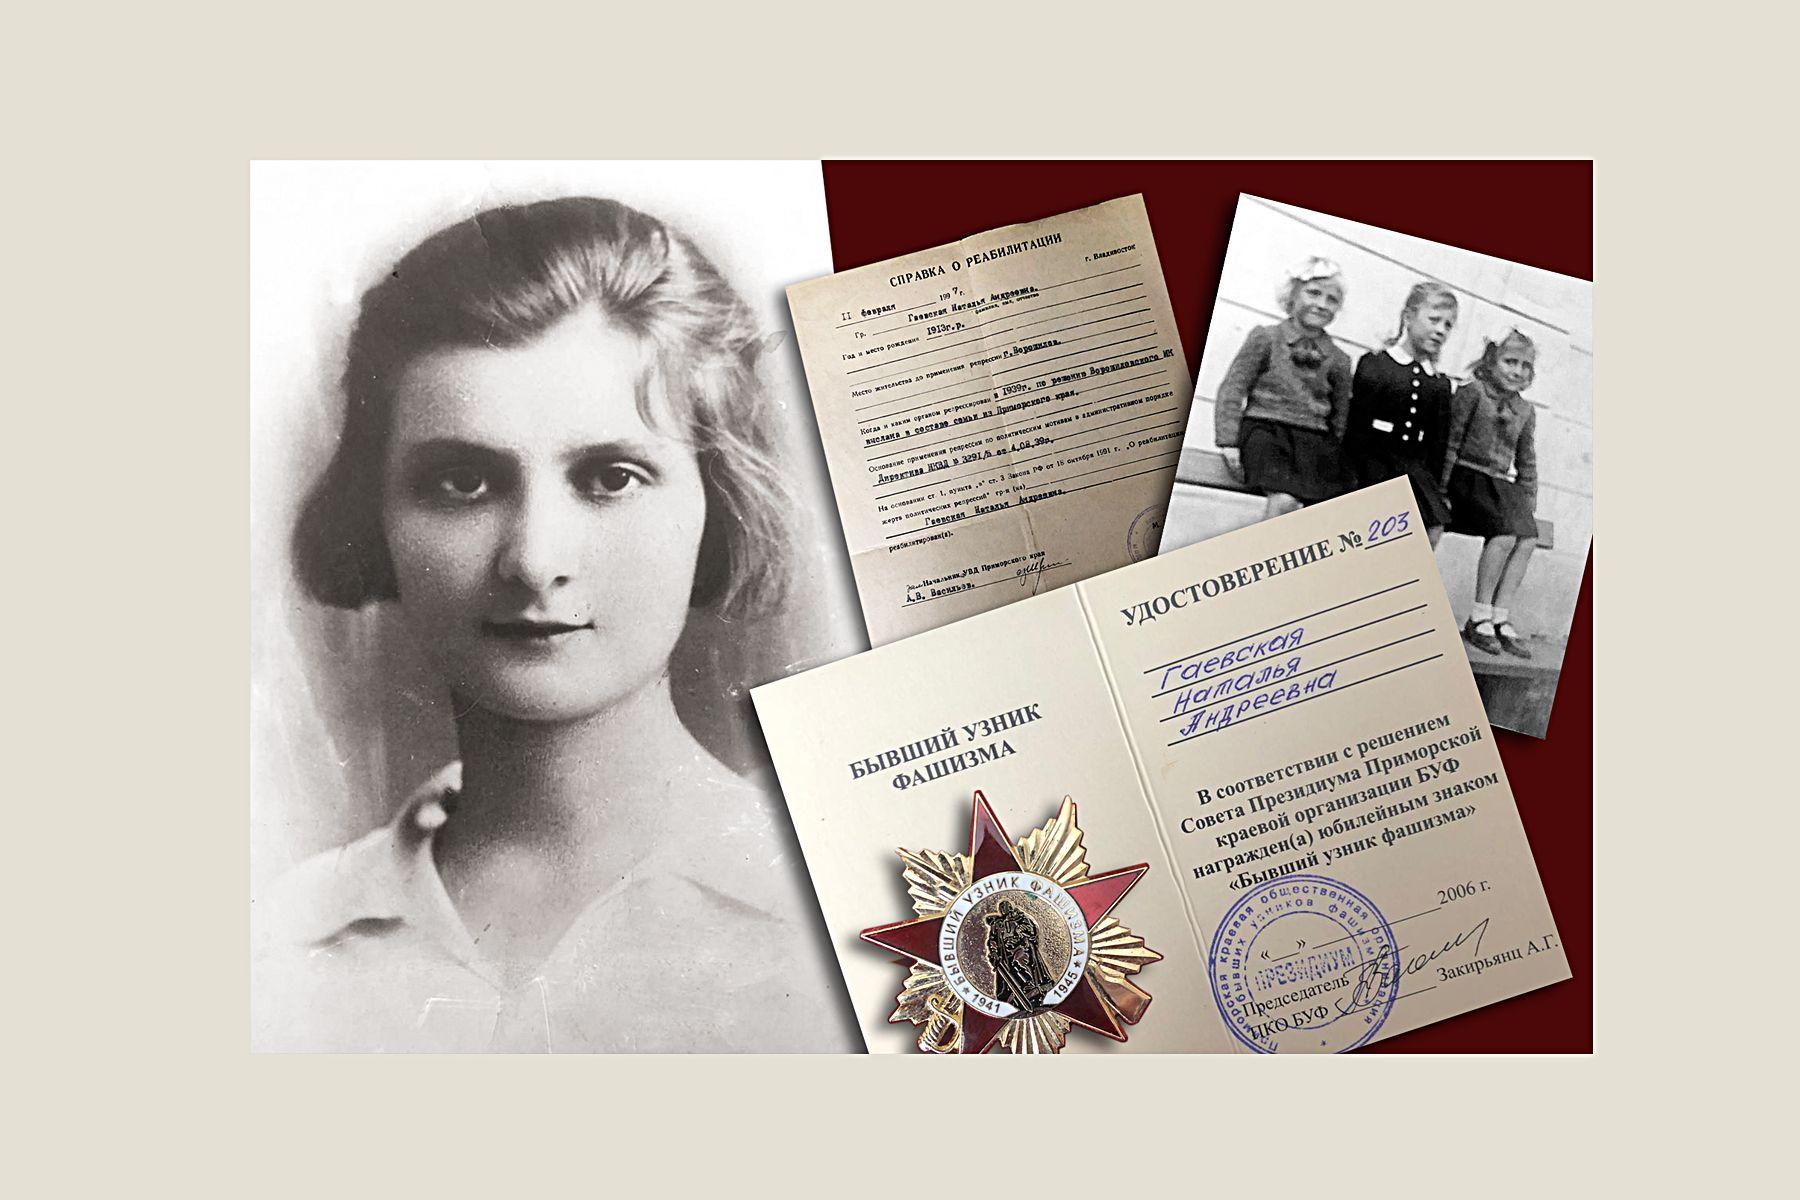 75 лет Победы: Гаевская Наталья Андреевна